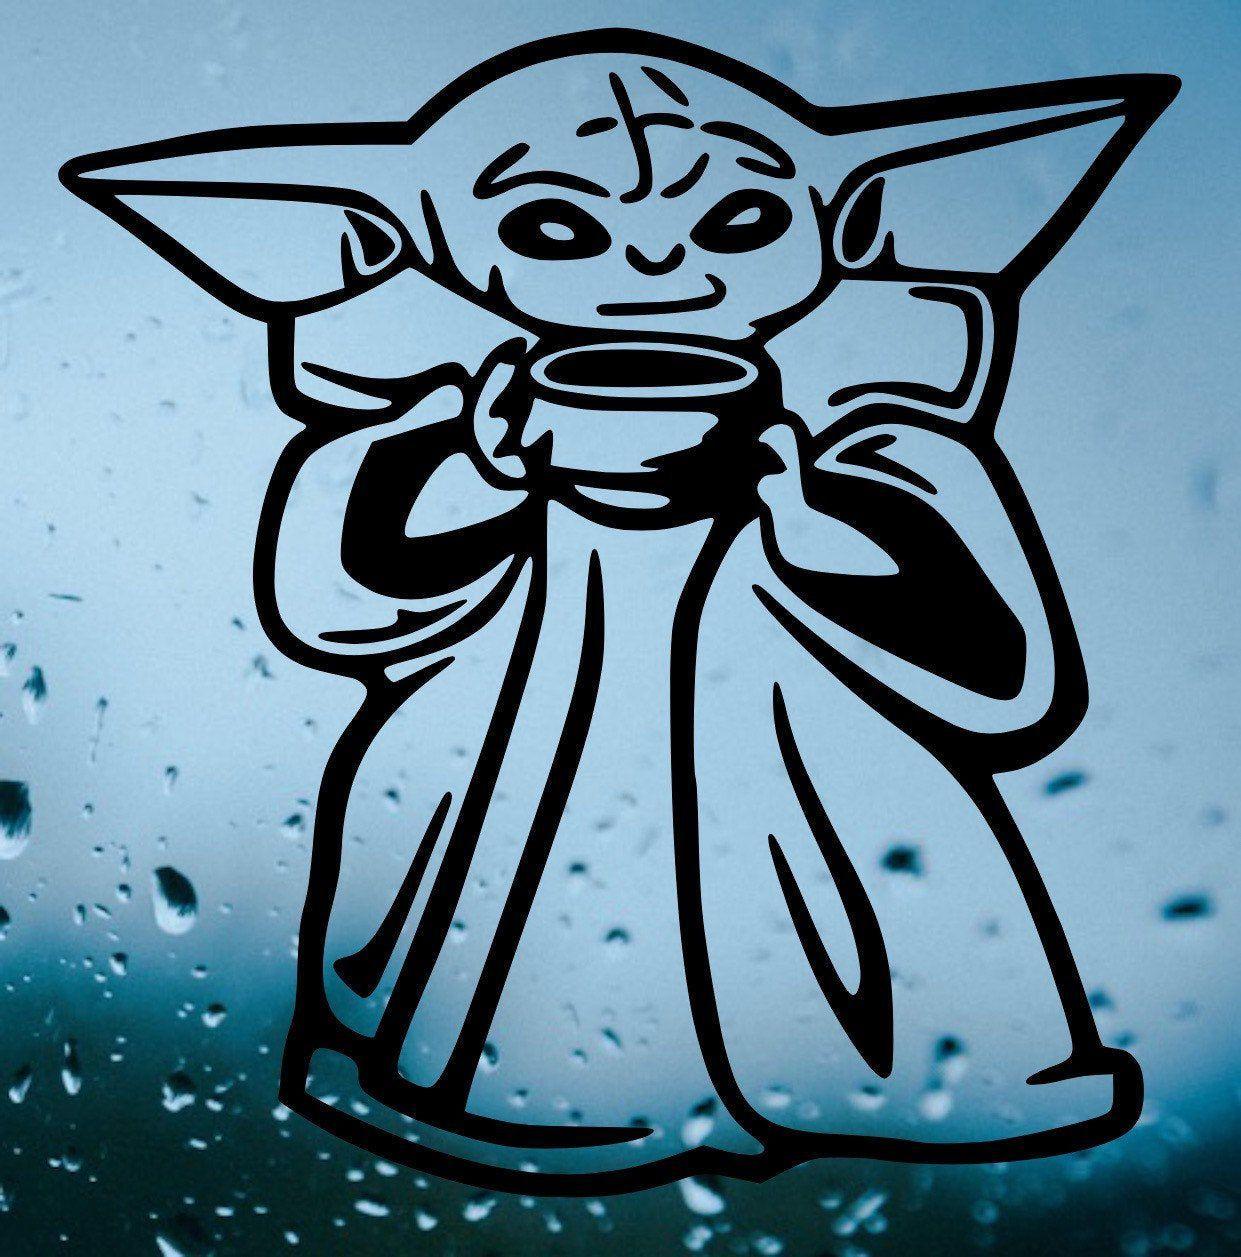 Baby Yoda Decal Baby Yoda Sticker Baby Yoda Coffee Baby Yoda Vinyl Baby Yoda Sipping T Memes Da Marvel